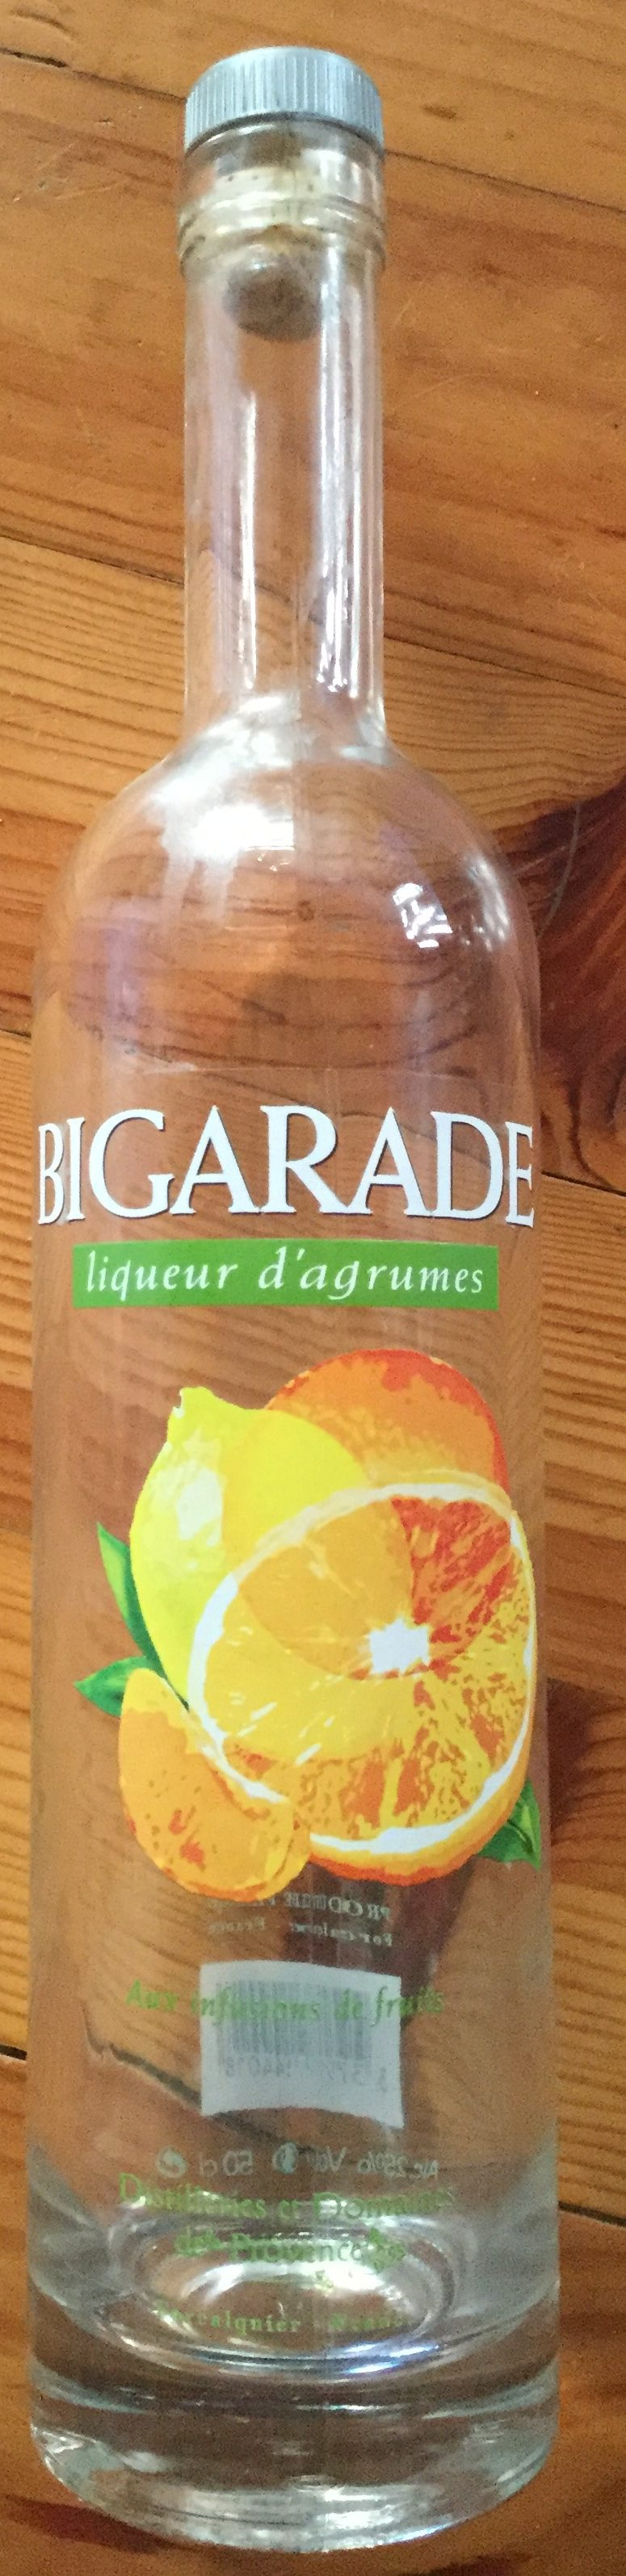 Bigarade - Product